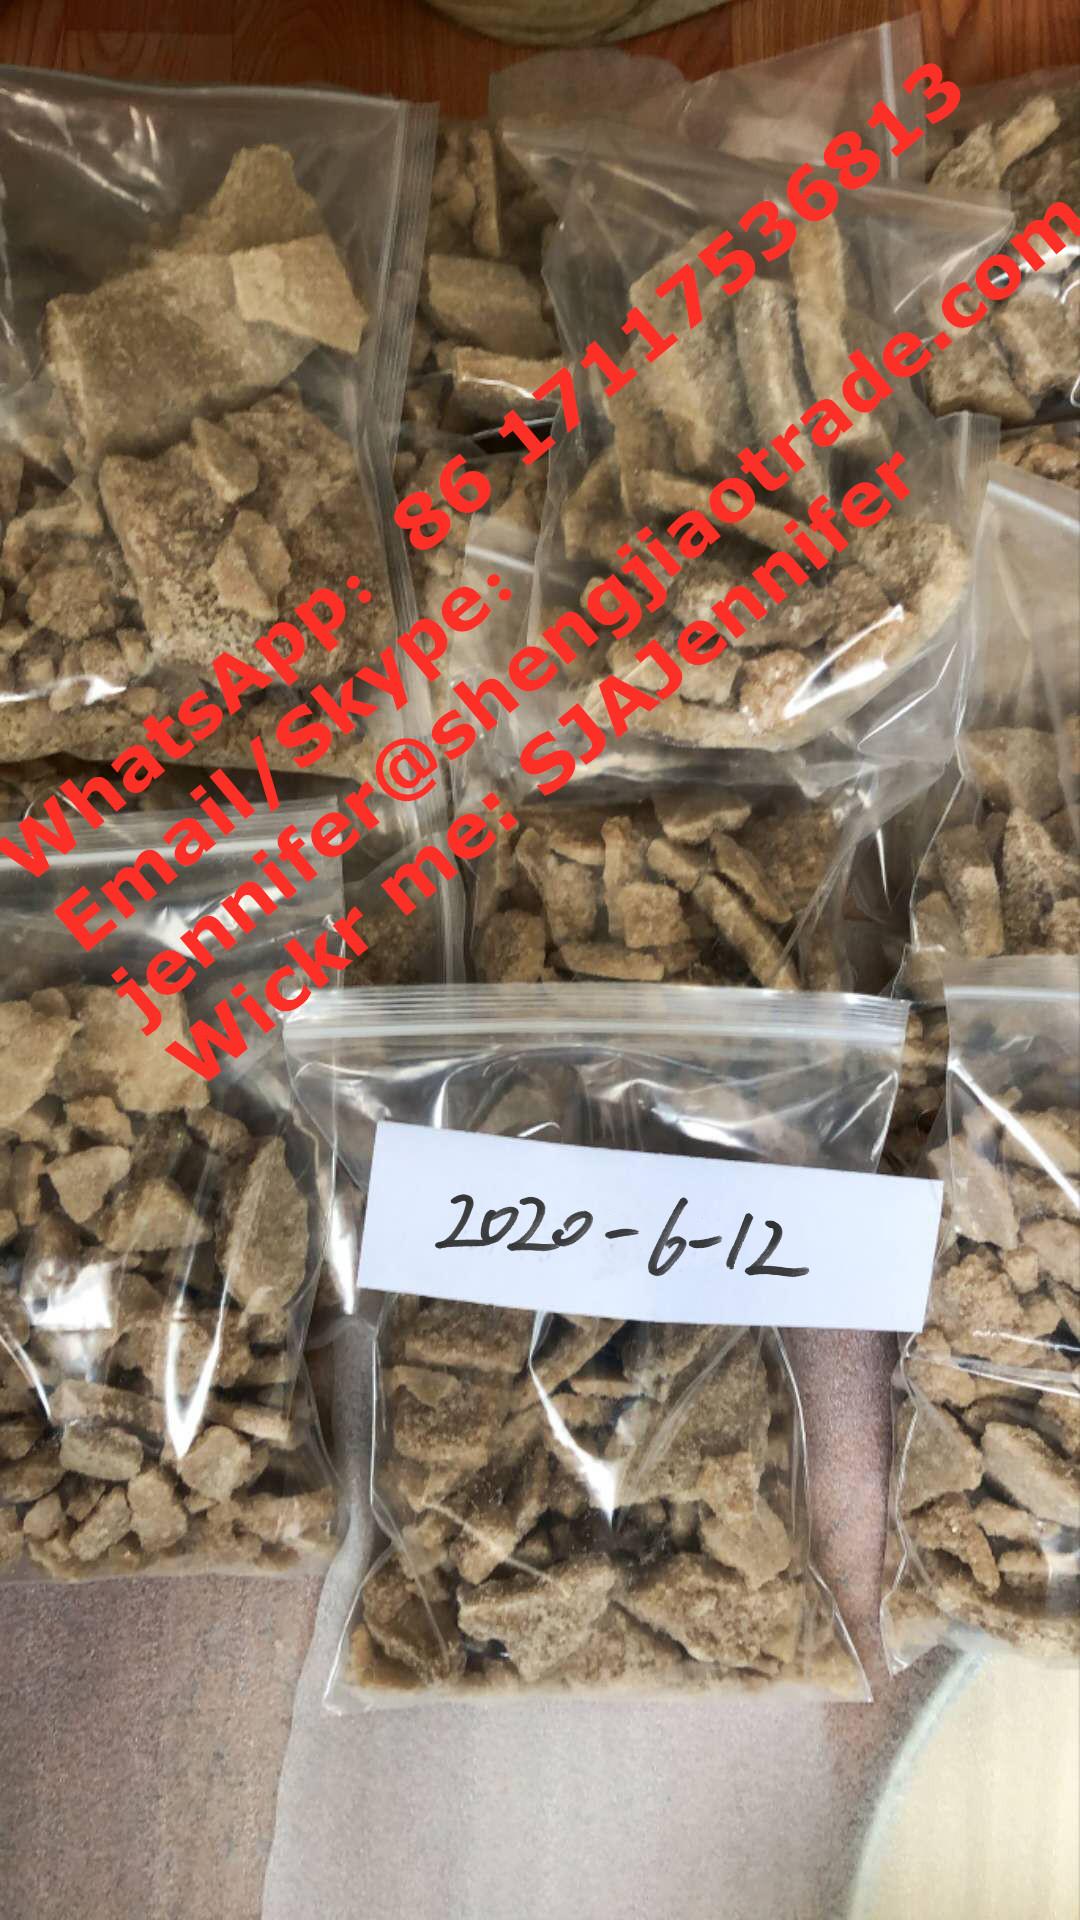 Pharmaceutical Inter Tan Brown Pink Blue Eu Euty Eutylon Eutylone Eu safe shipping WsA:8617117536813